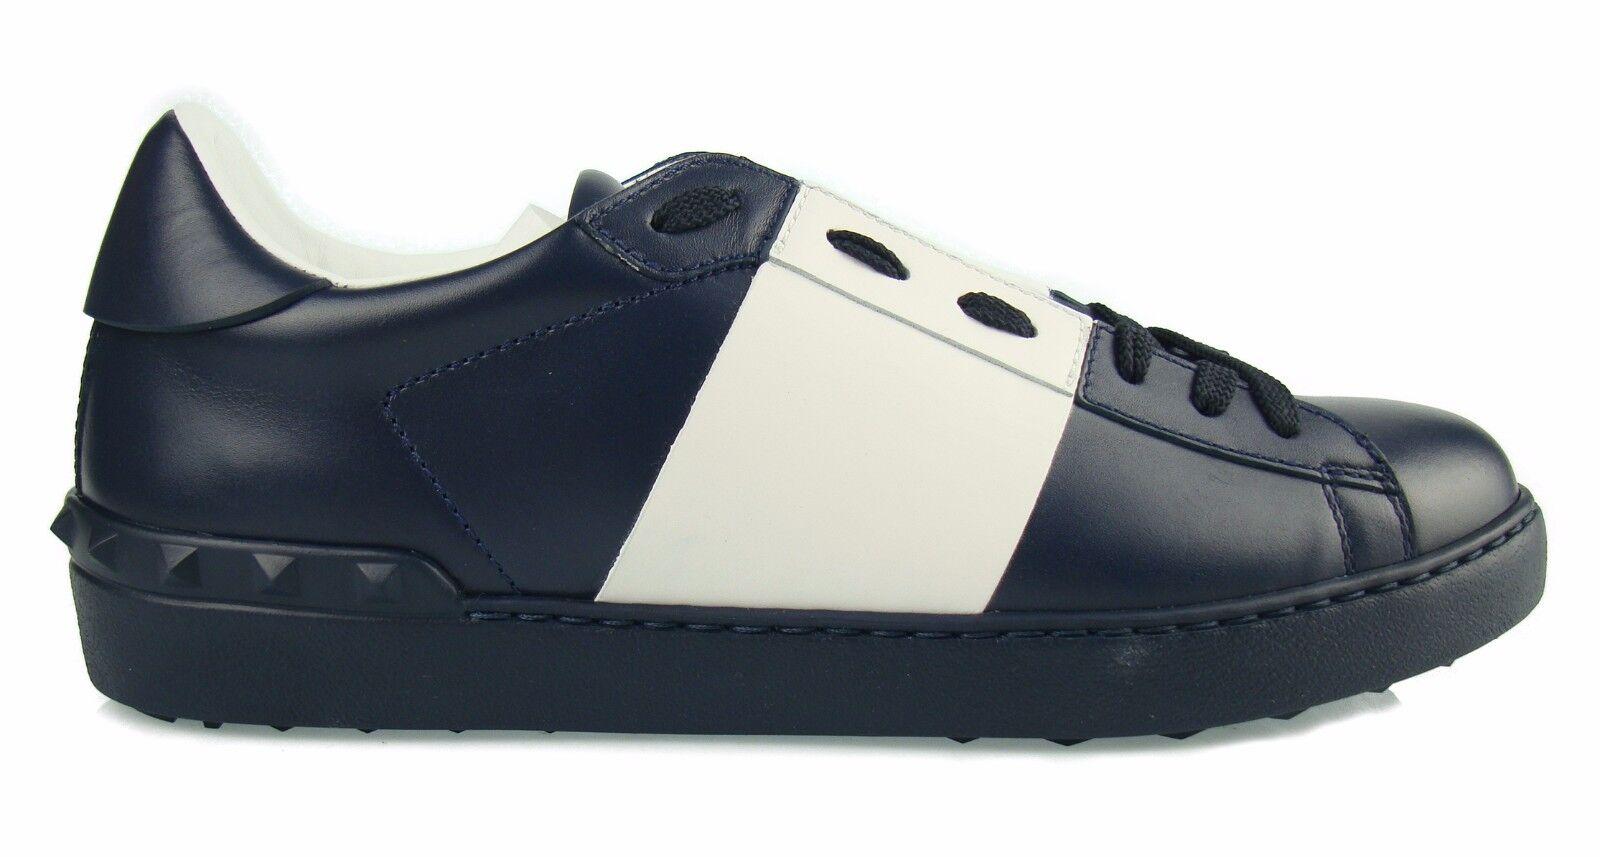 VALENTINO GARAVANI scarpe da ginnastica 470 Scarpe uomo MAN scarpe 100%AUTg7W